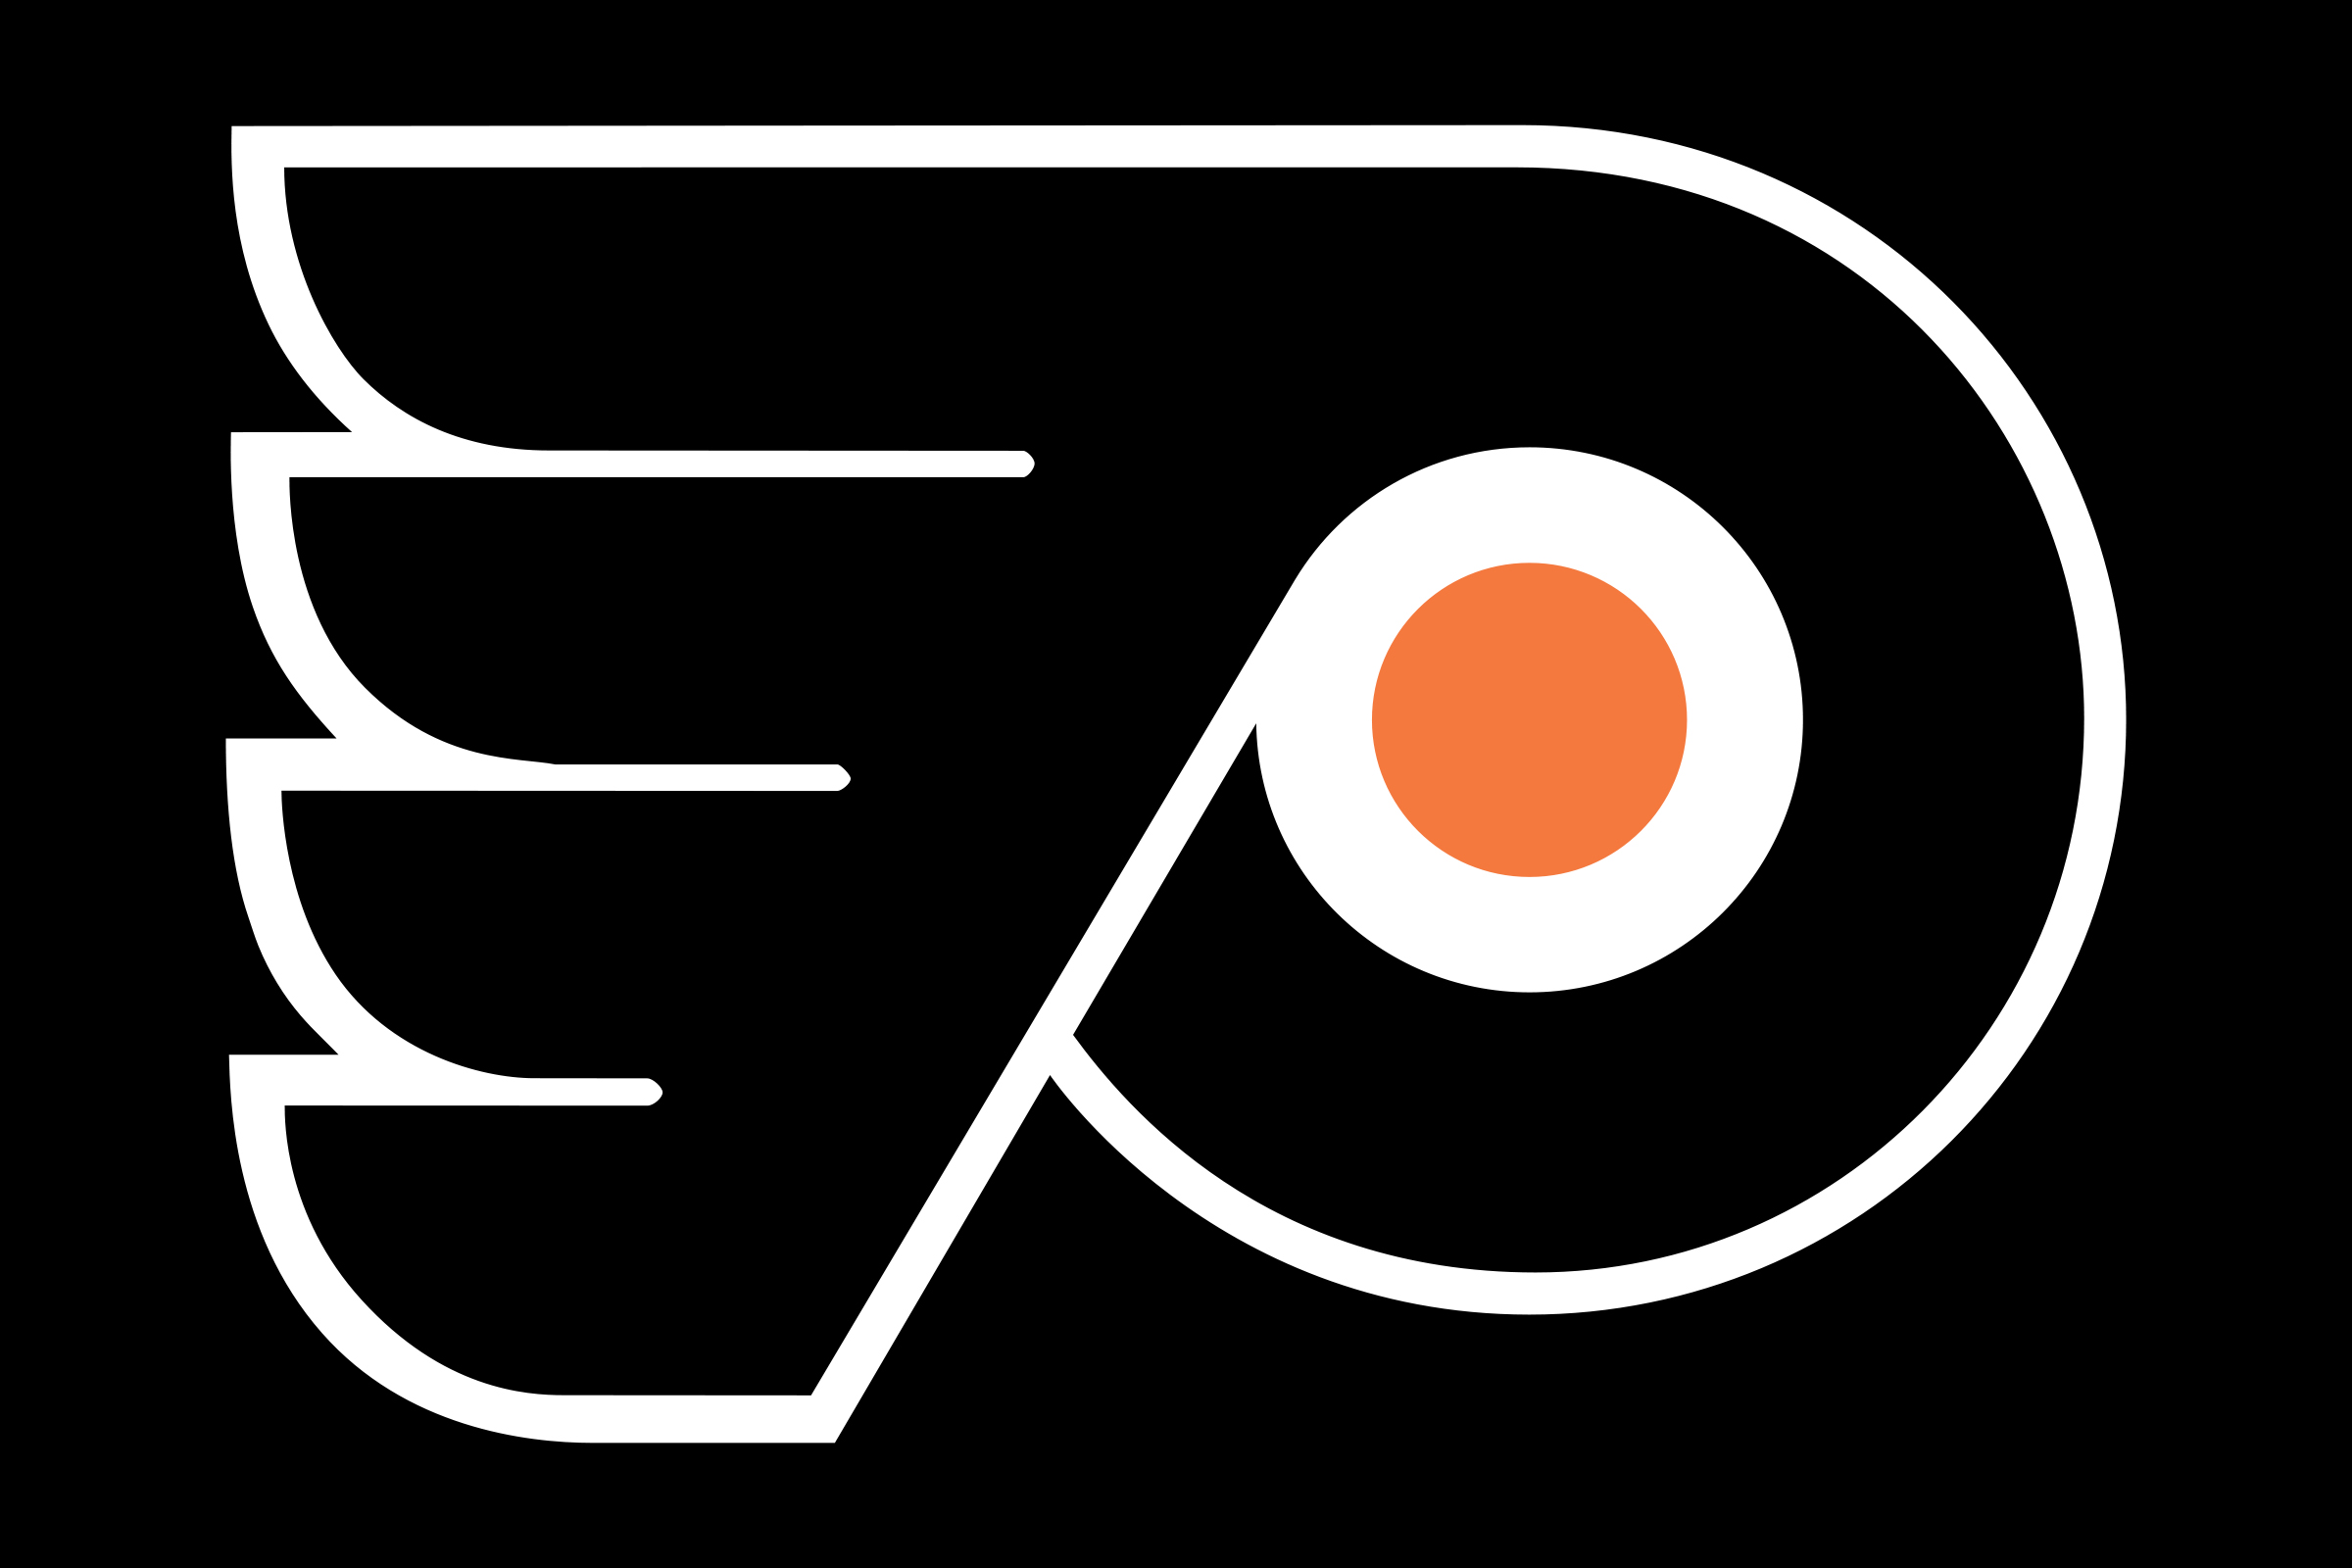 Meaning Philadelphia Flyers Logo And Symbol